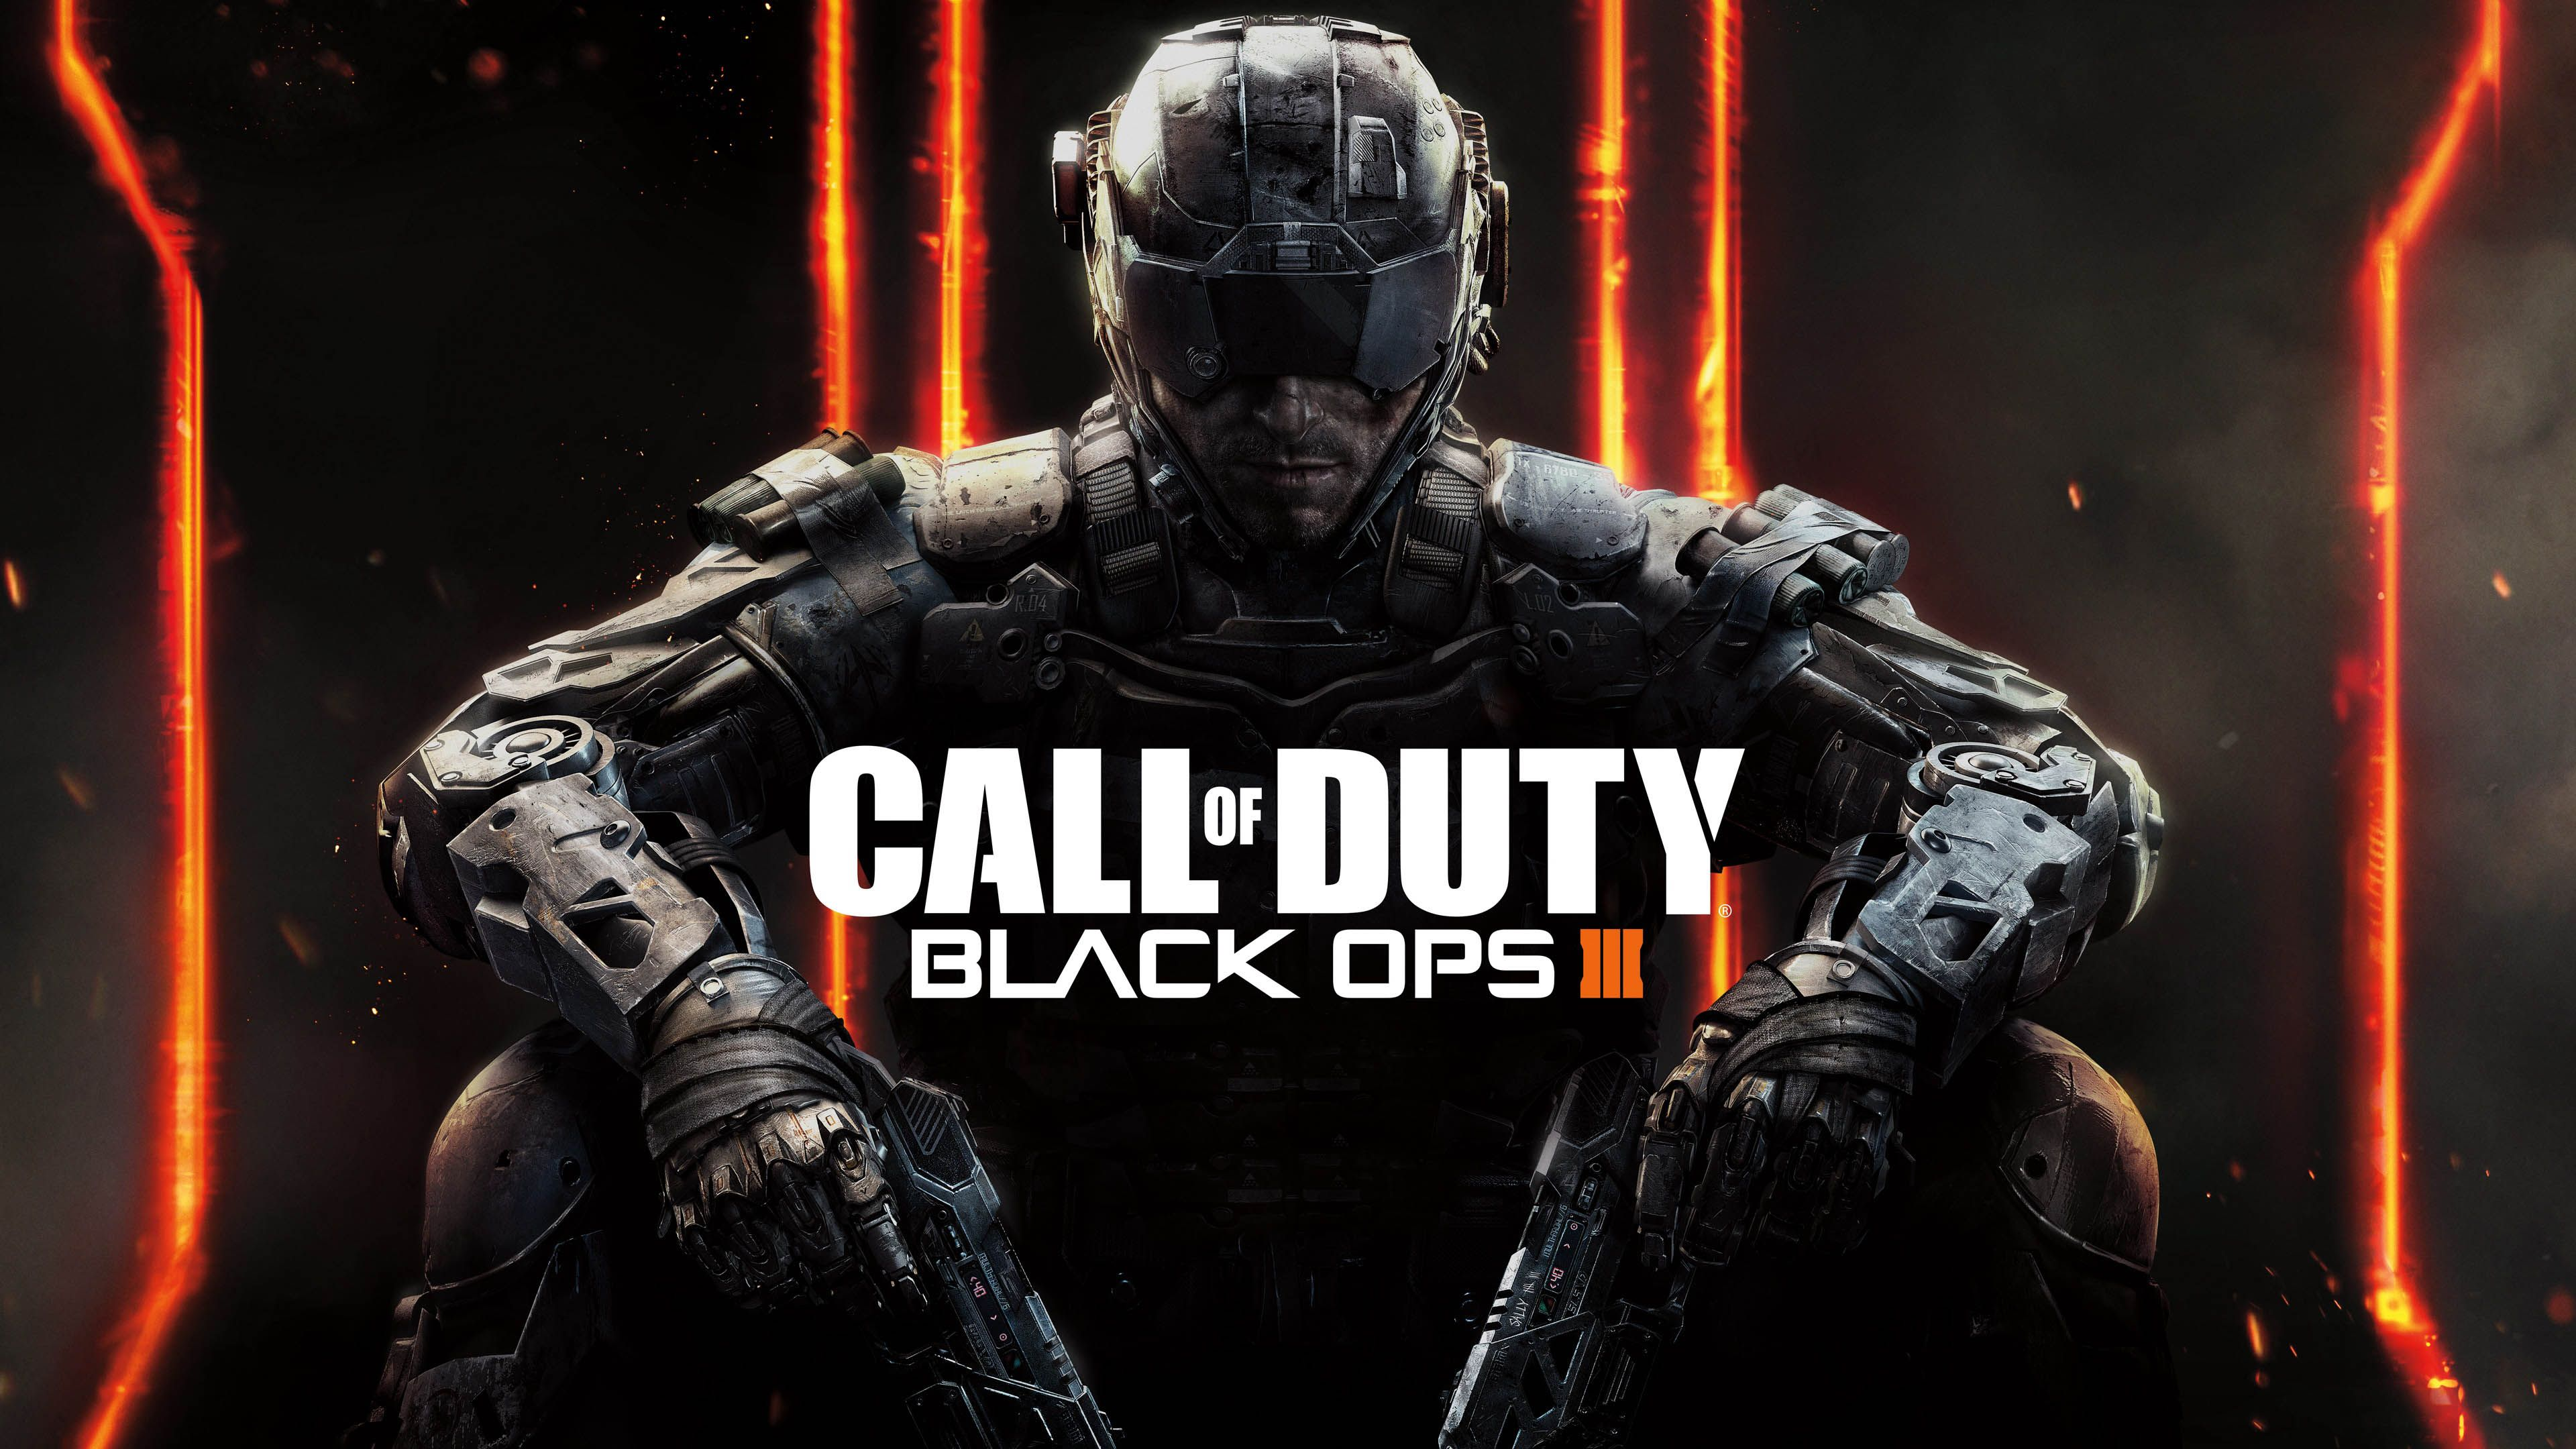 Fond D Ecran 3840x2160 Call Of Duty Black Ops Iii Black Ops 3